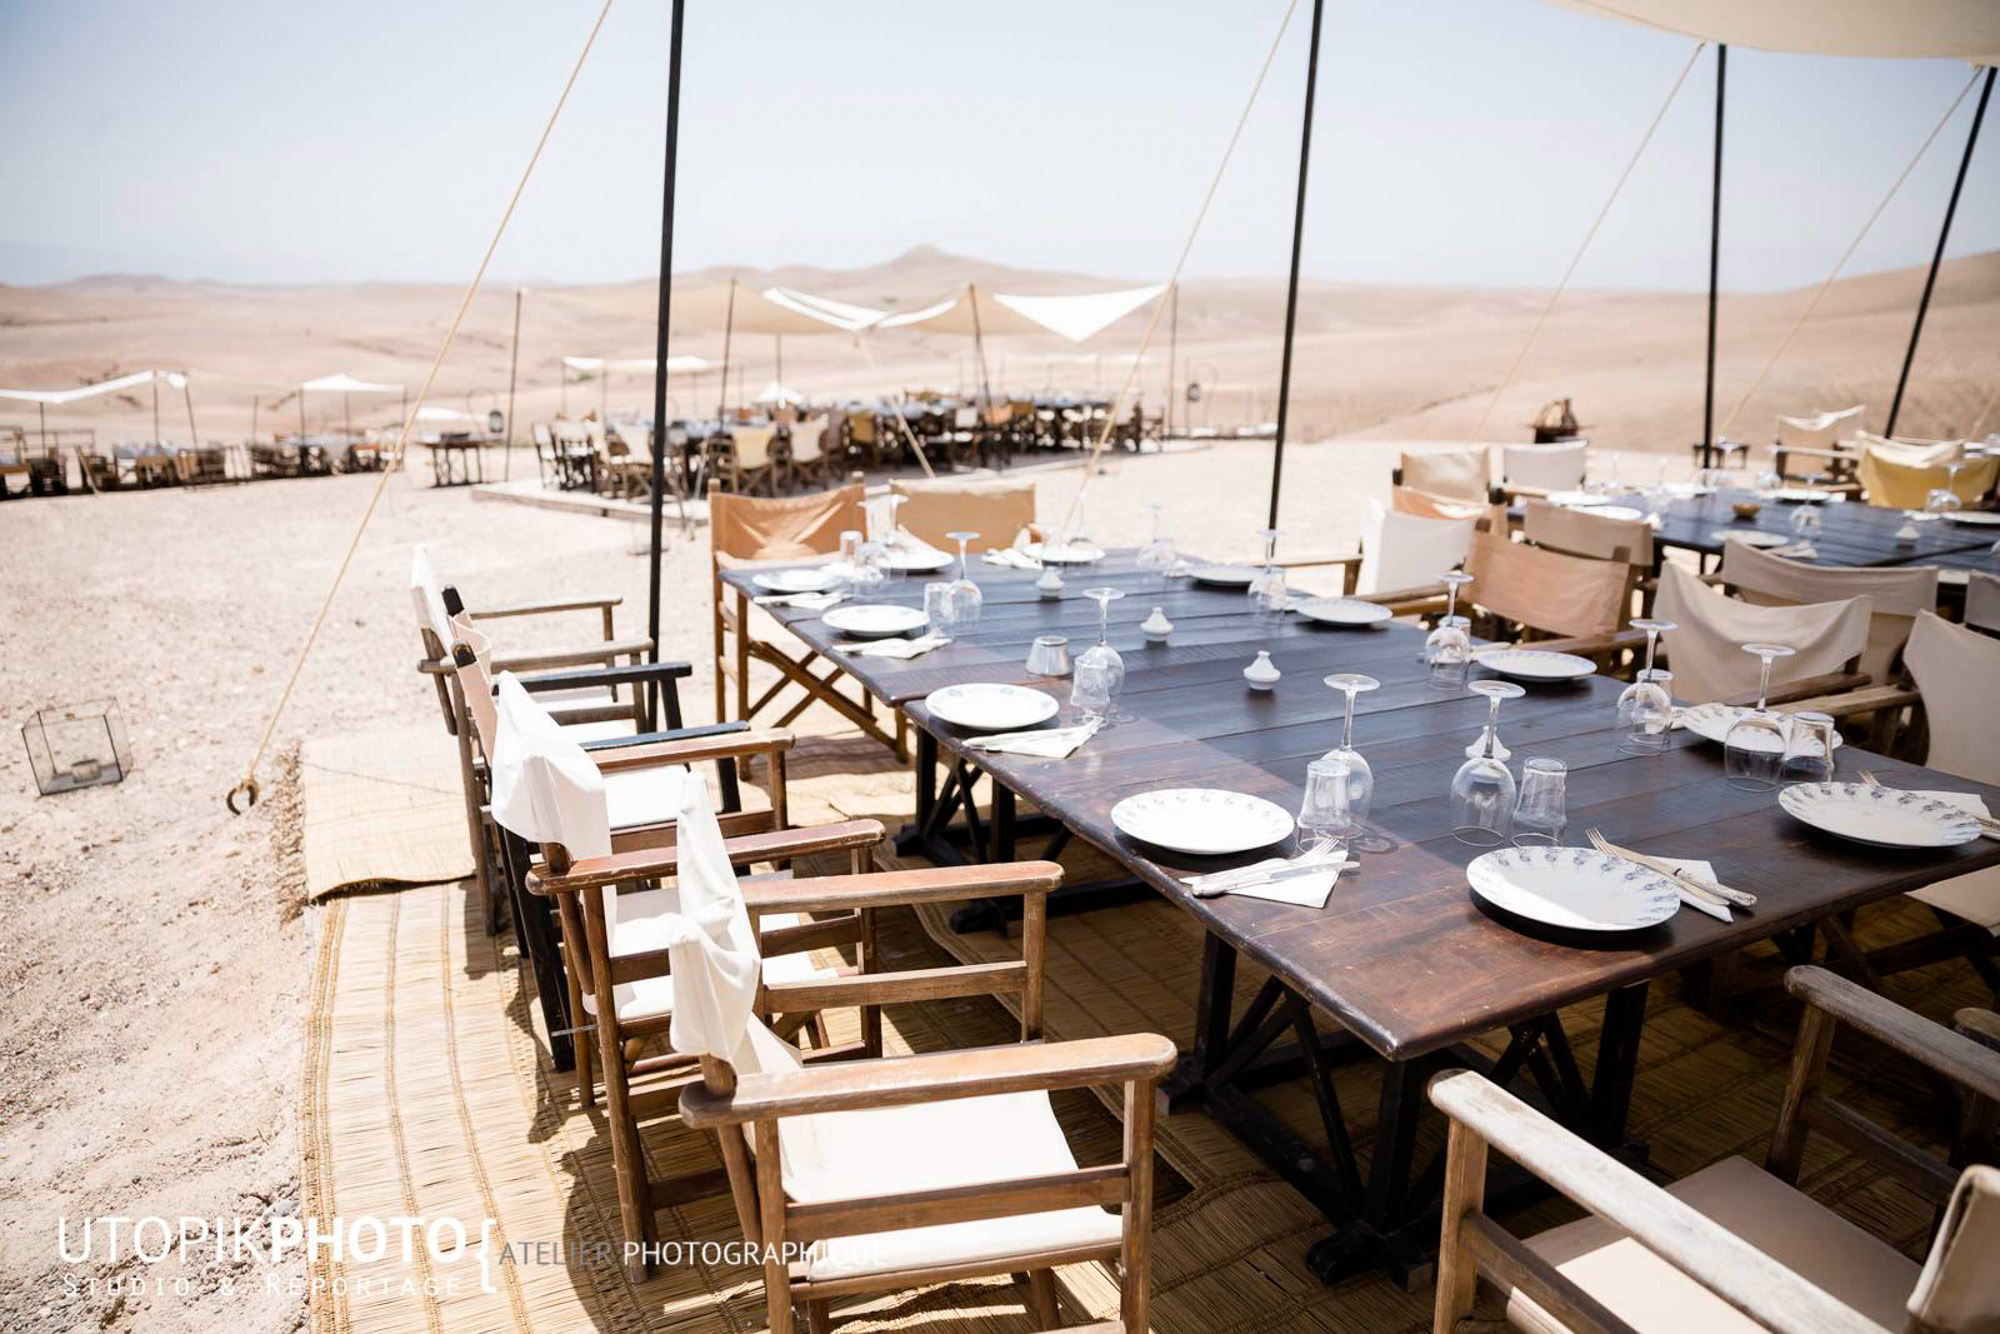 diner et déjeuner désert marrakech agafay maroc